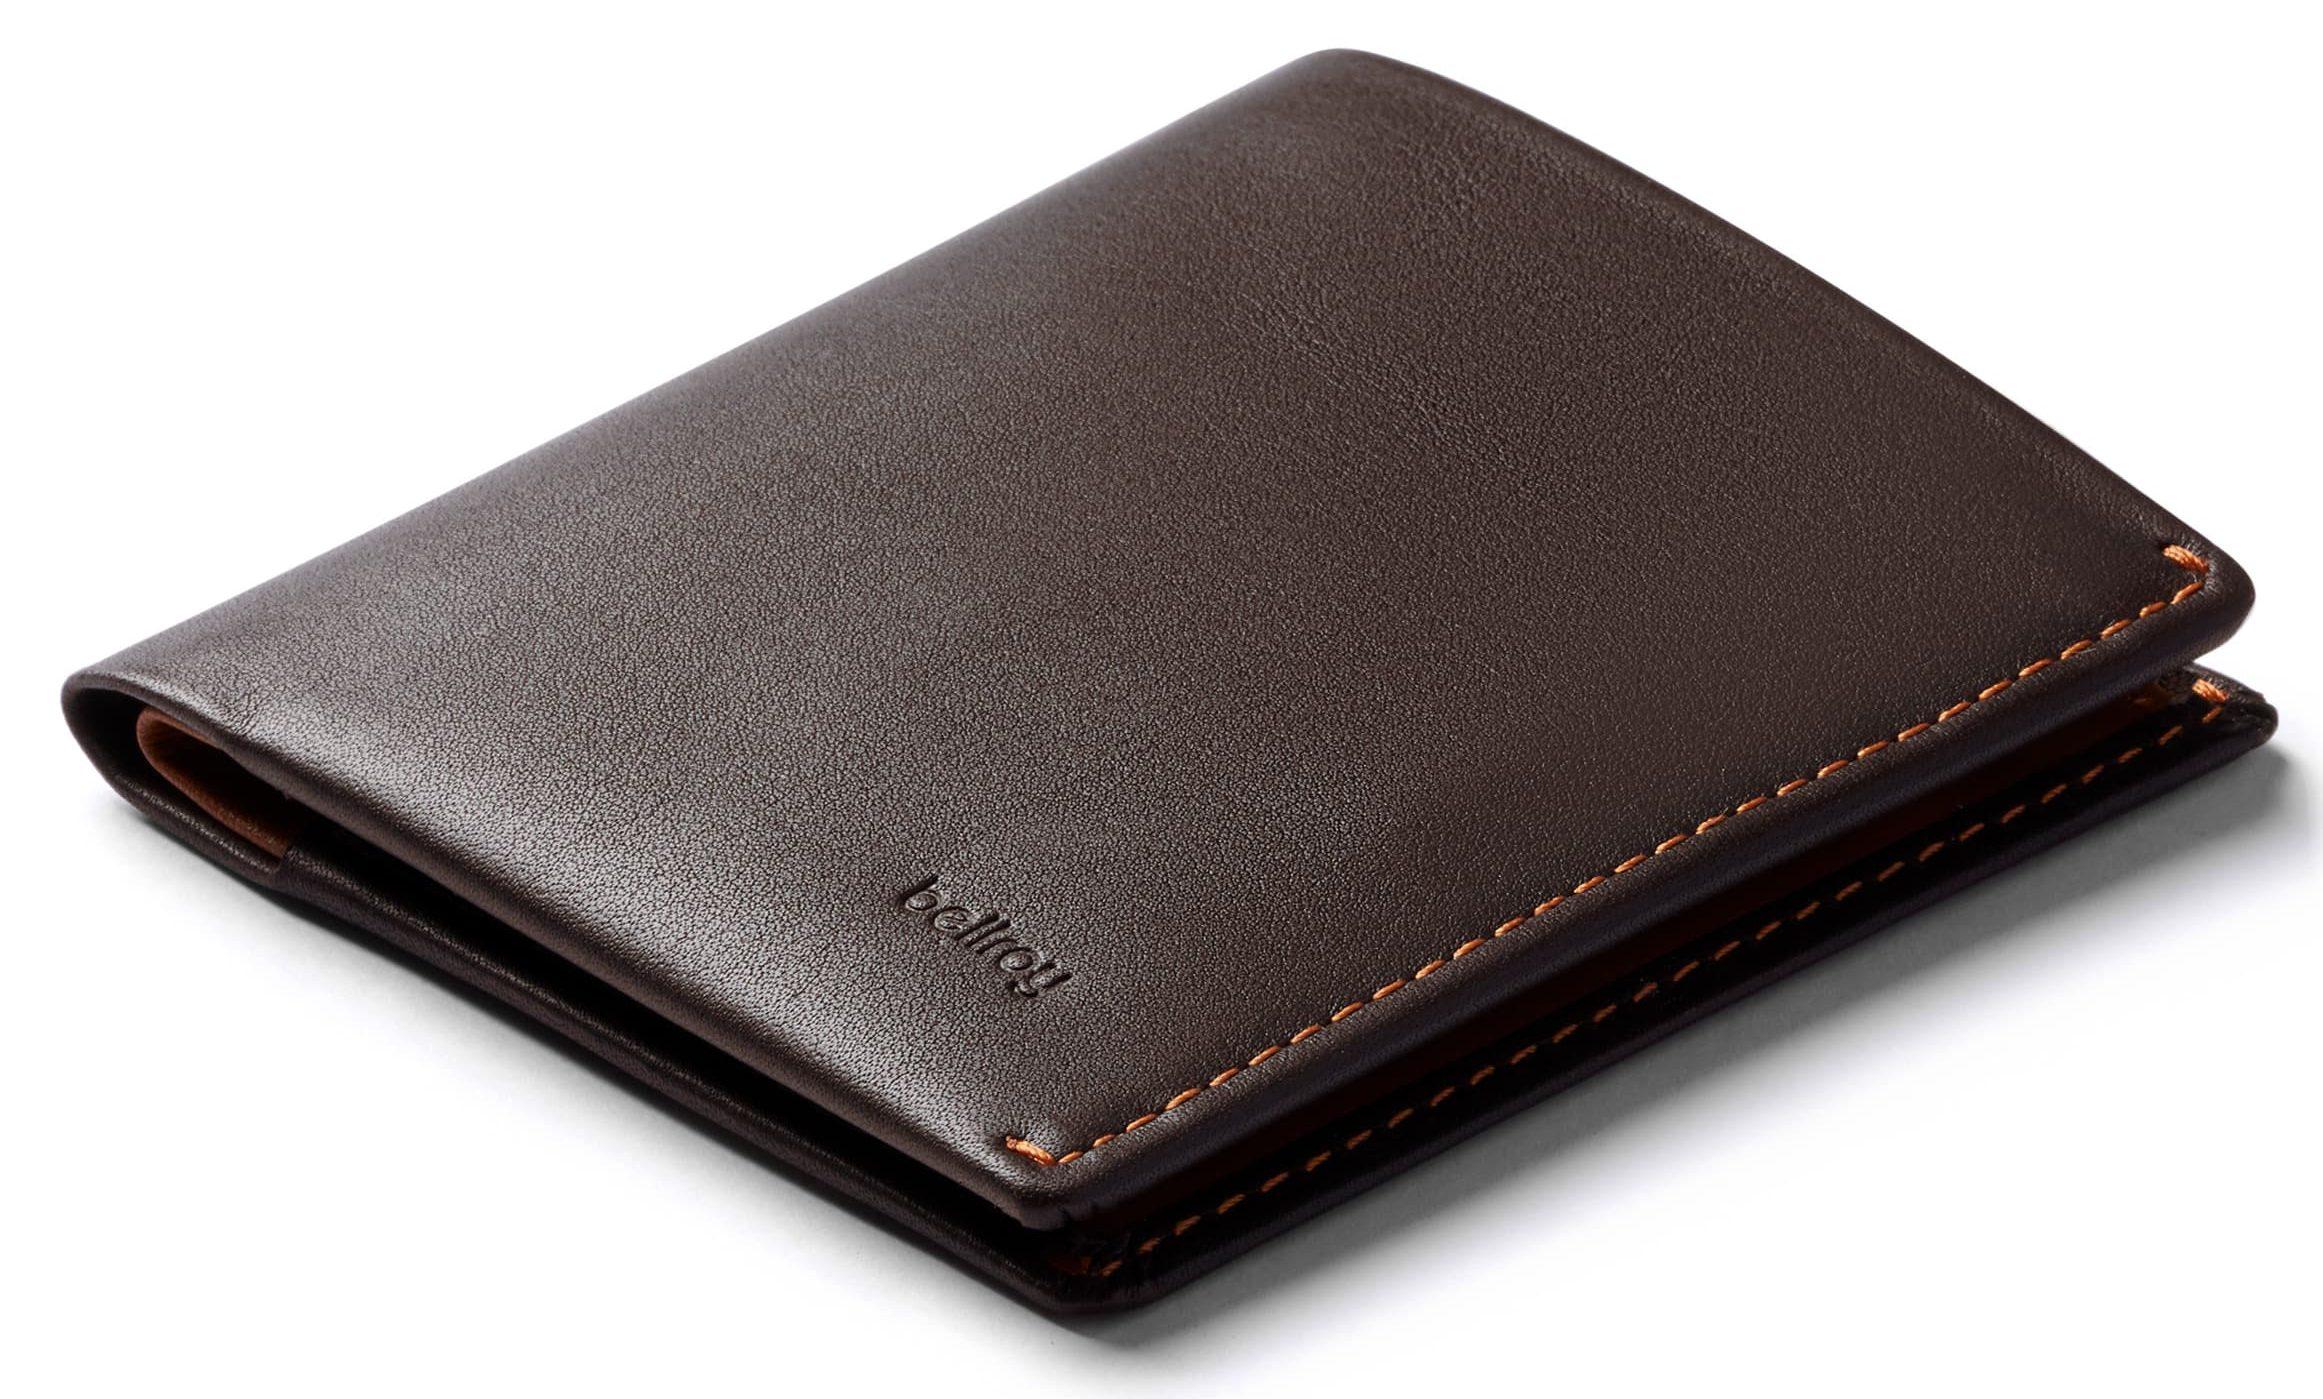 Bellroy Note Sleeve RFID Wallet - Best Gifts Under $100